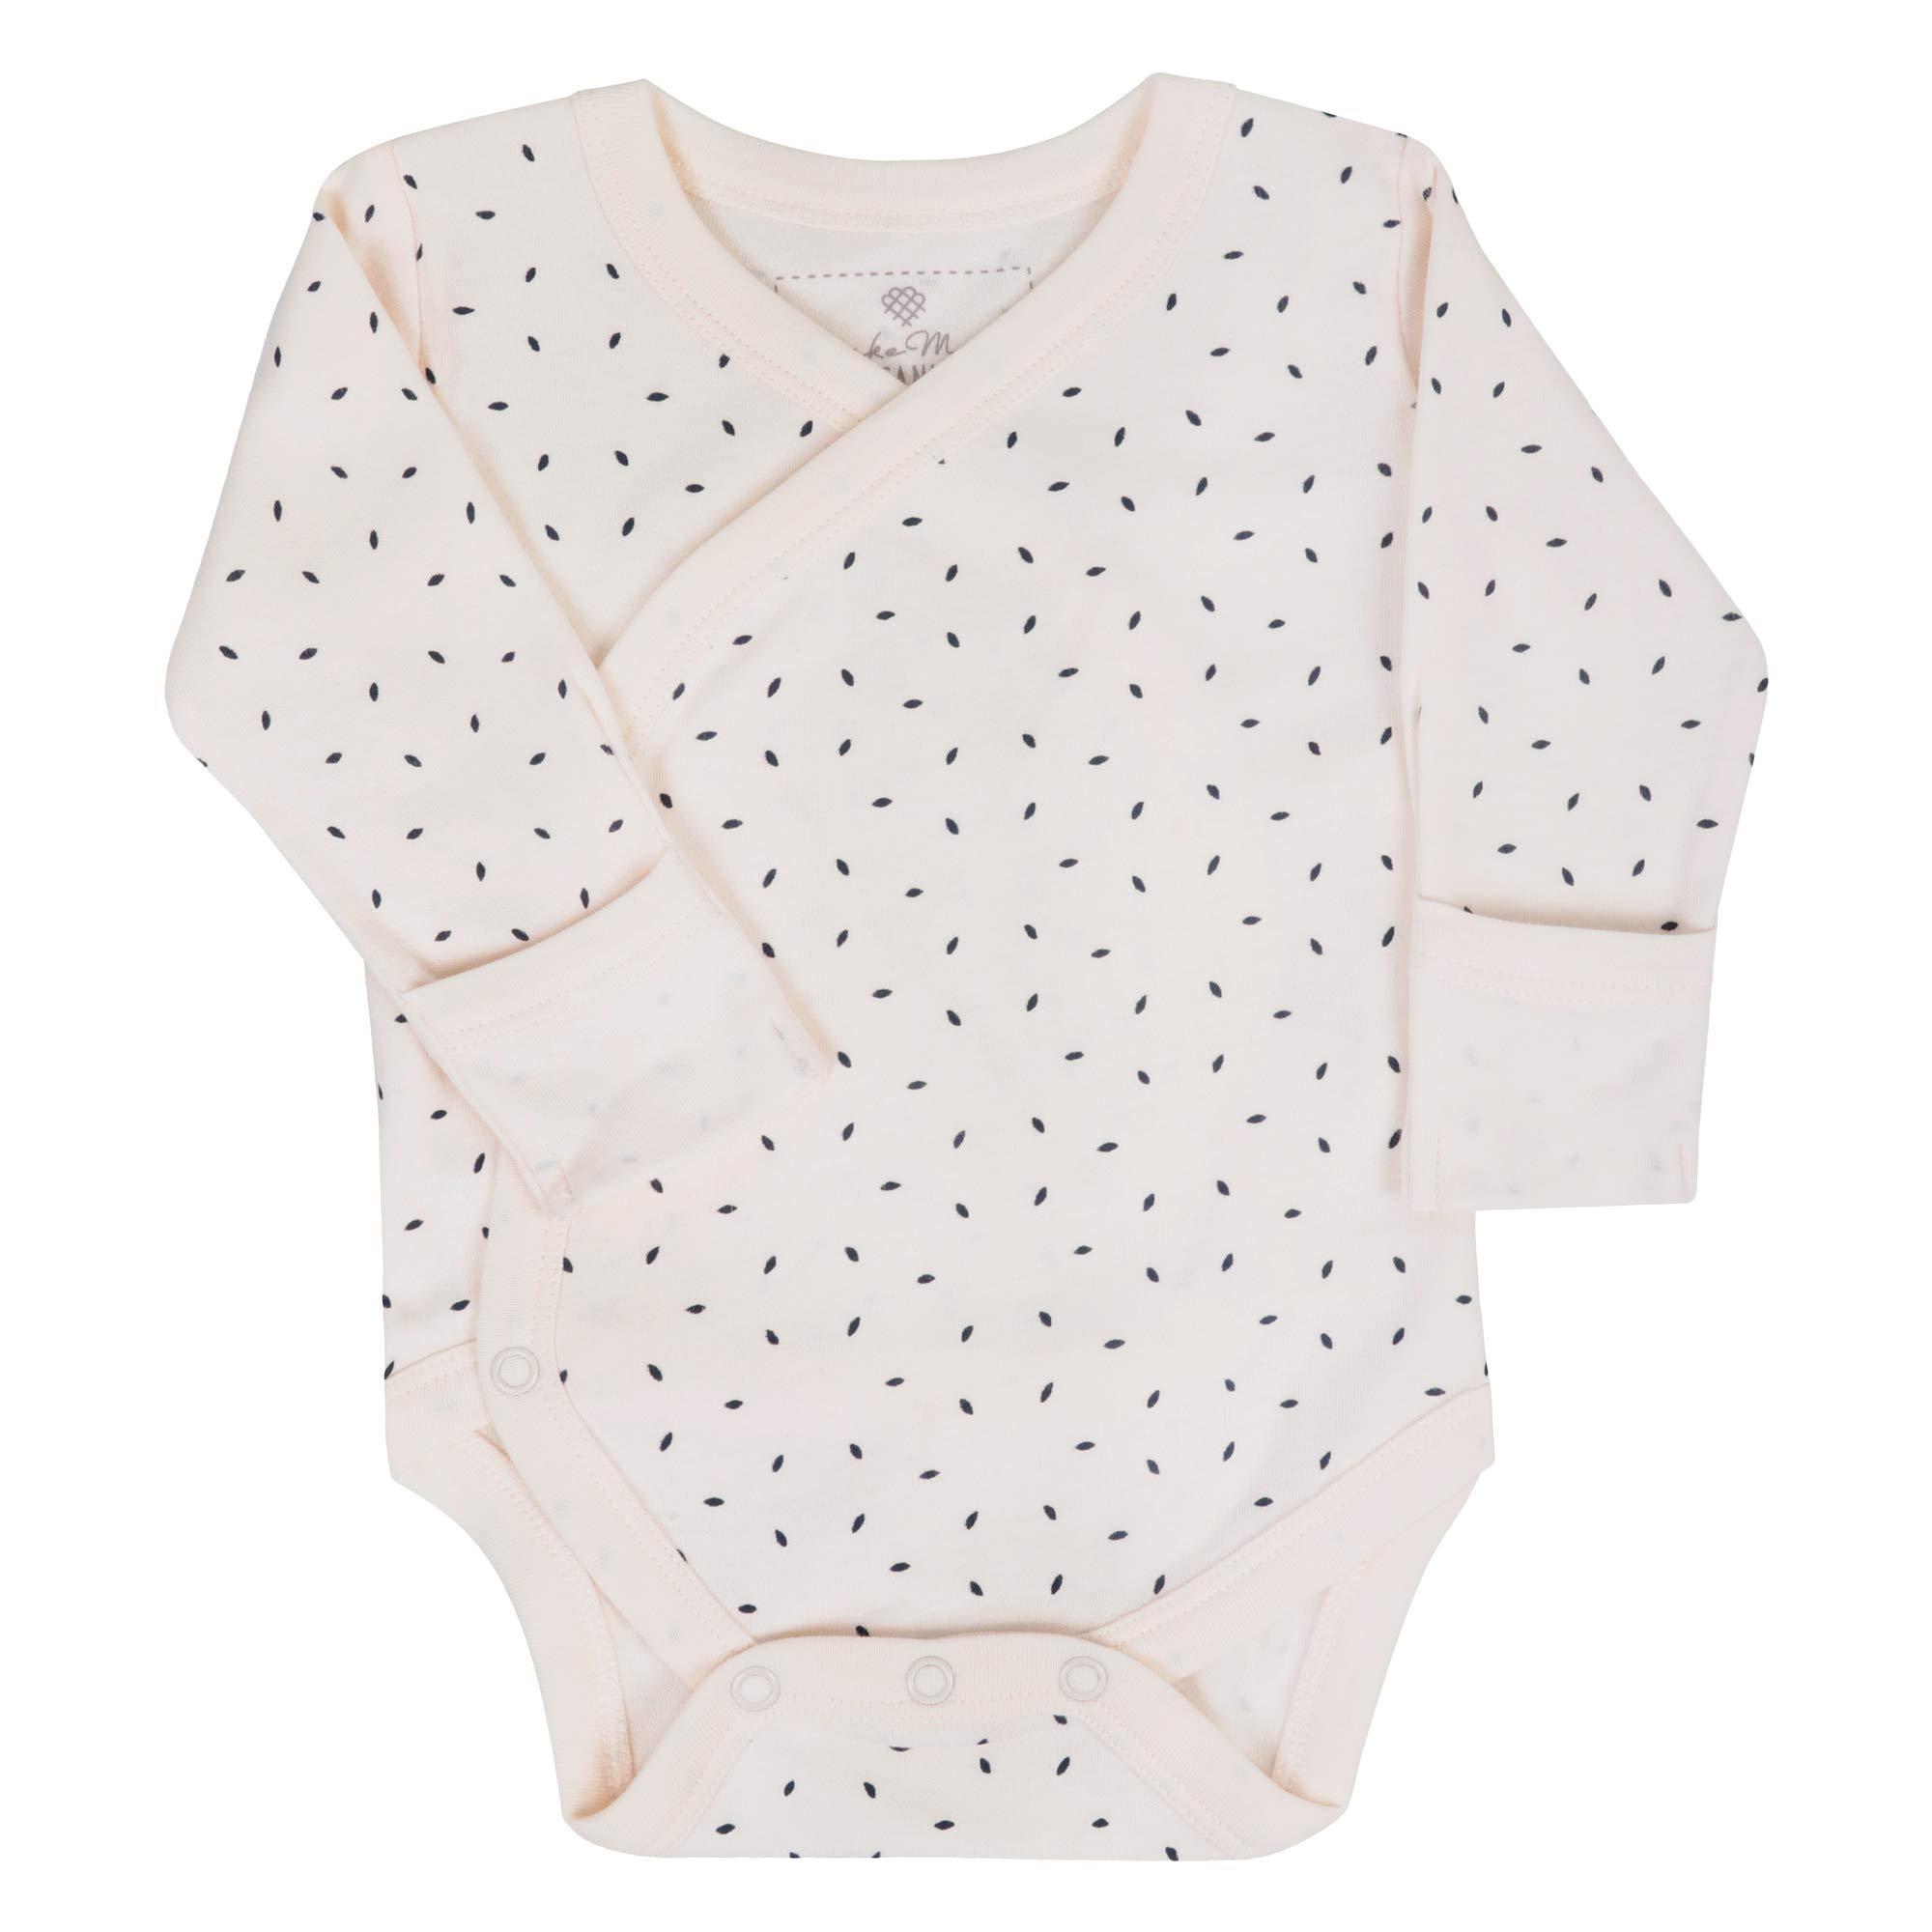 MakeMake Organics Organic Cotton Baby Kimono Bodysuit